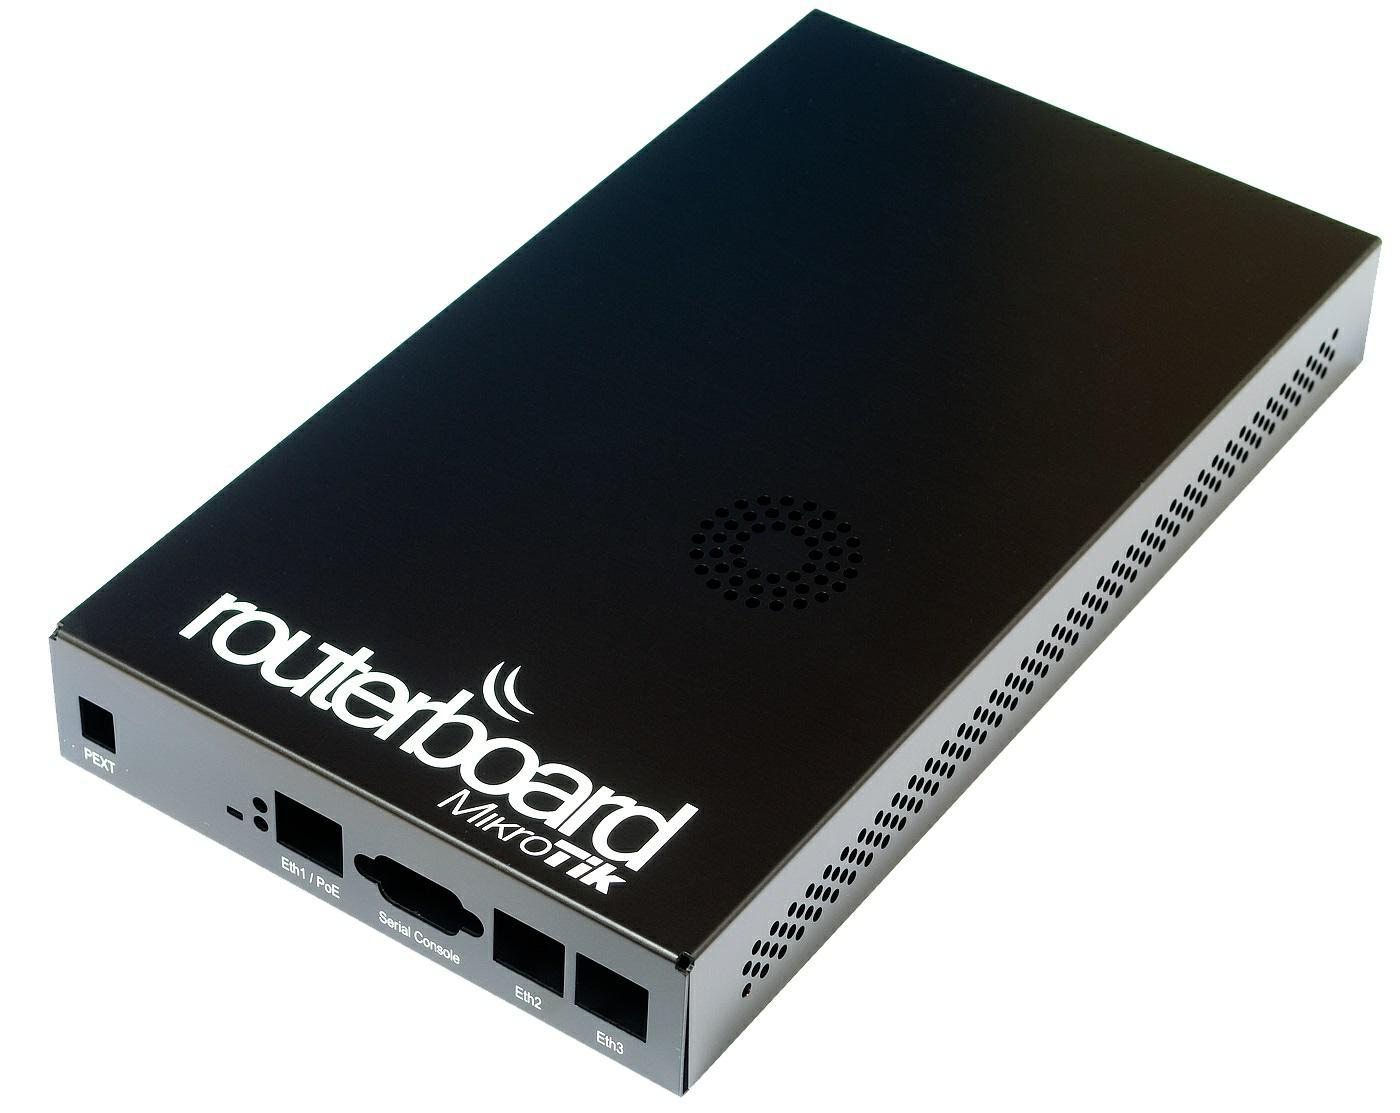 SICE Distributore Ufficiale  Enclosures MikroTik Indoor Case for RB800 Series | CA800